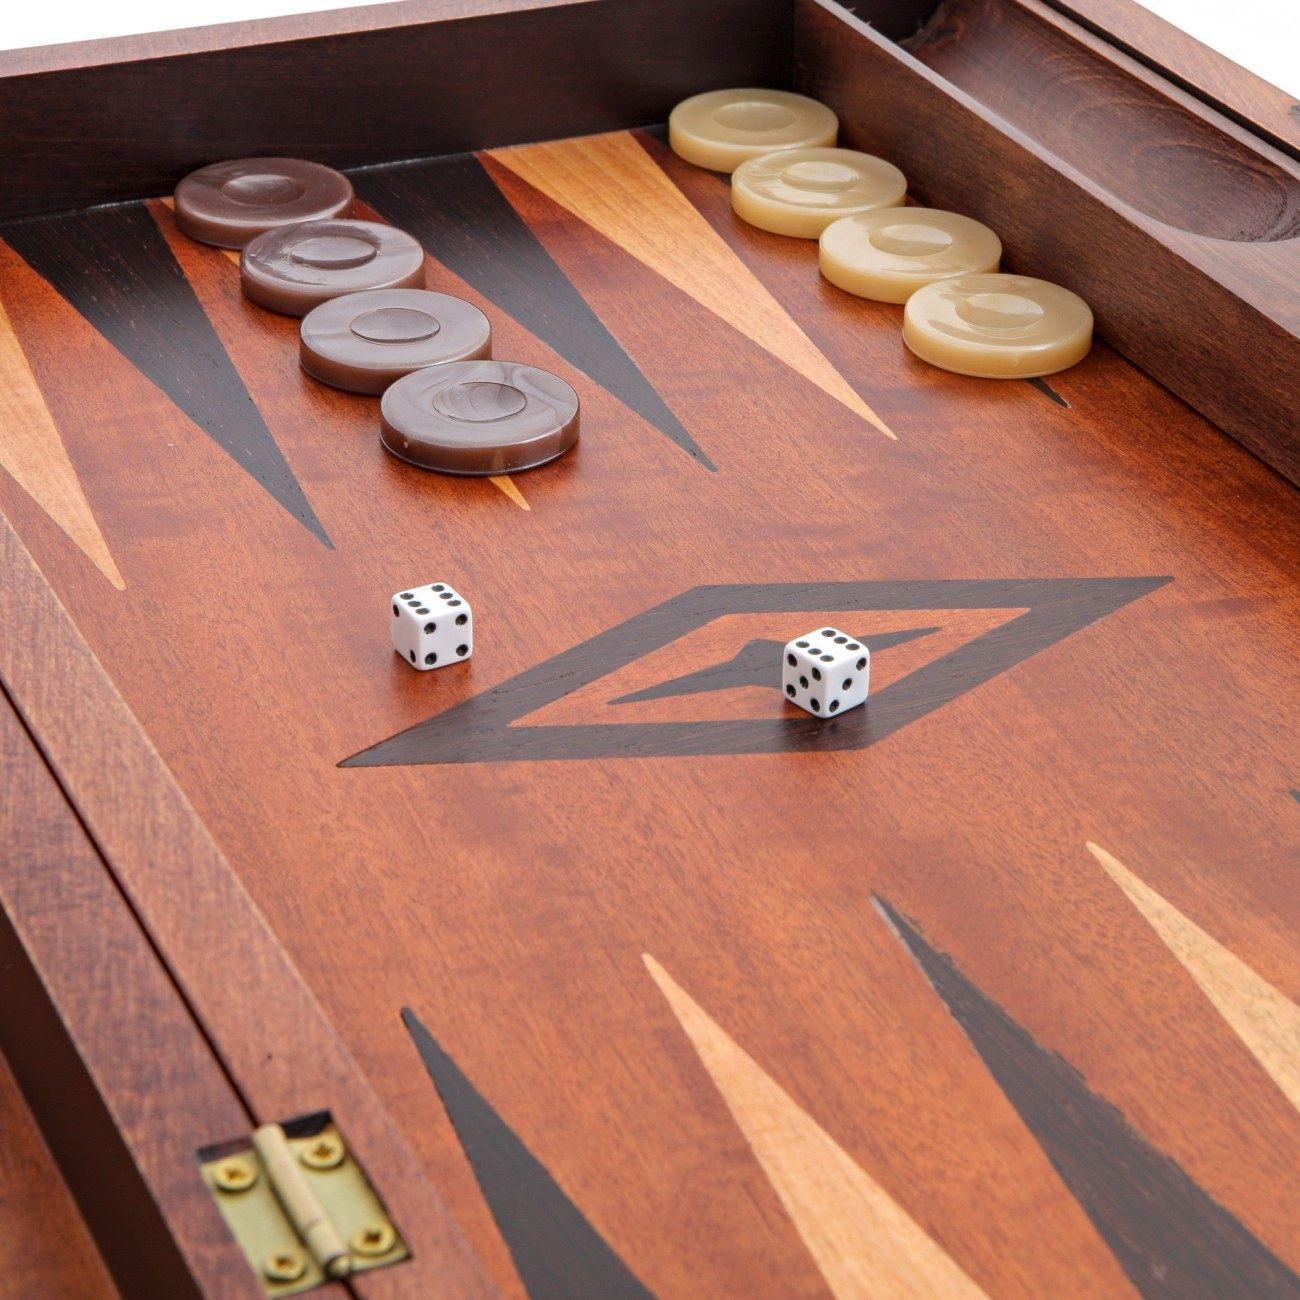 Backgammon Online • Play Free Backgammon Game Backgammon